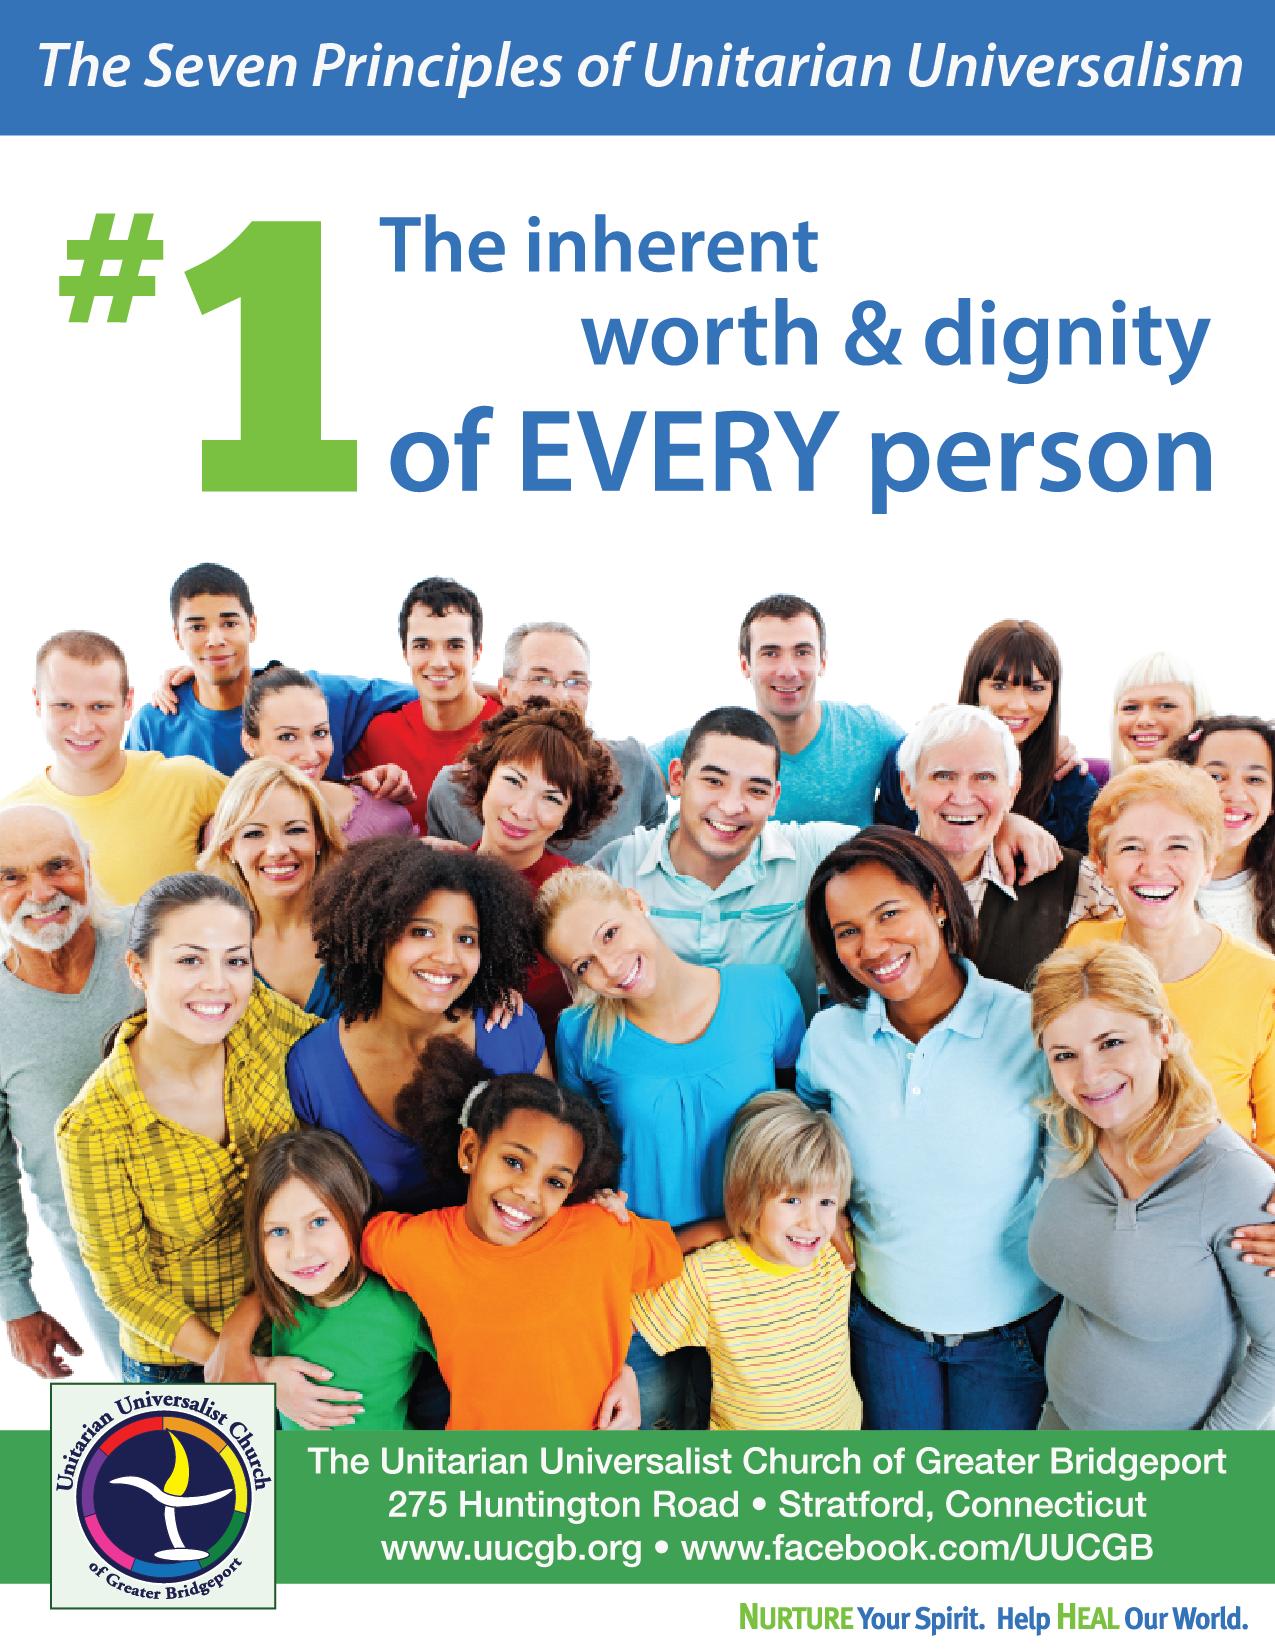 First principle of Unitarian Universalism Unitarian